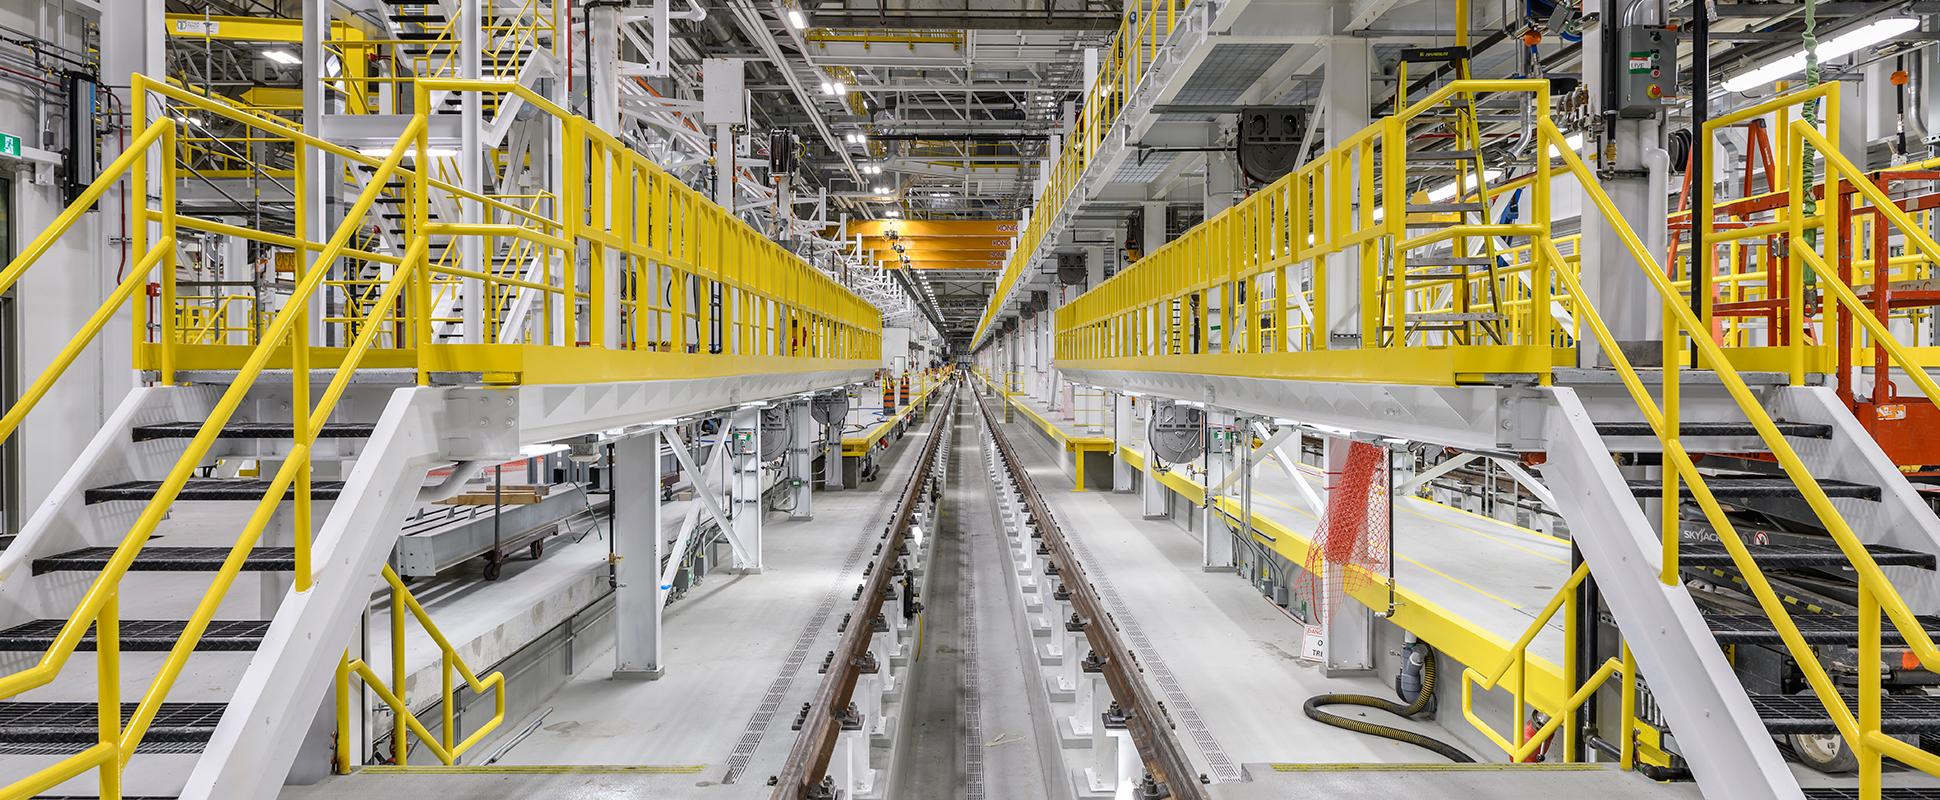 East Rail Maintenance Facility interior